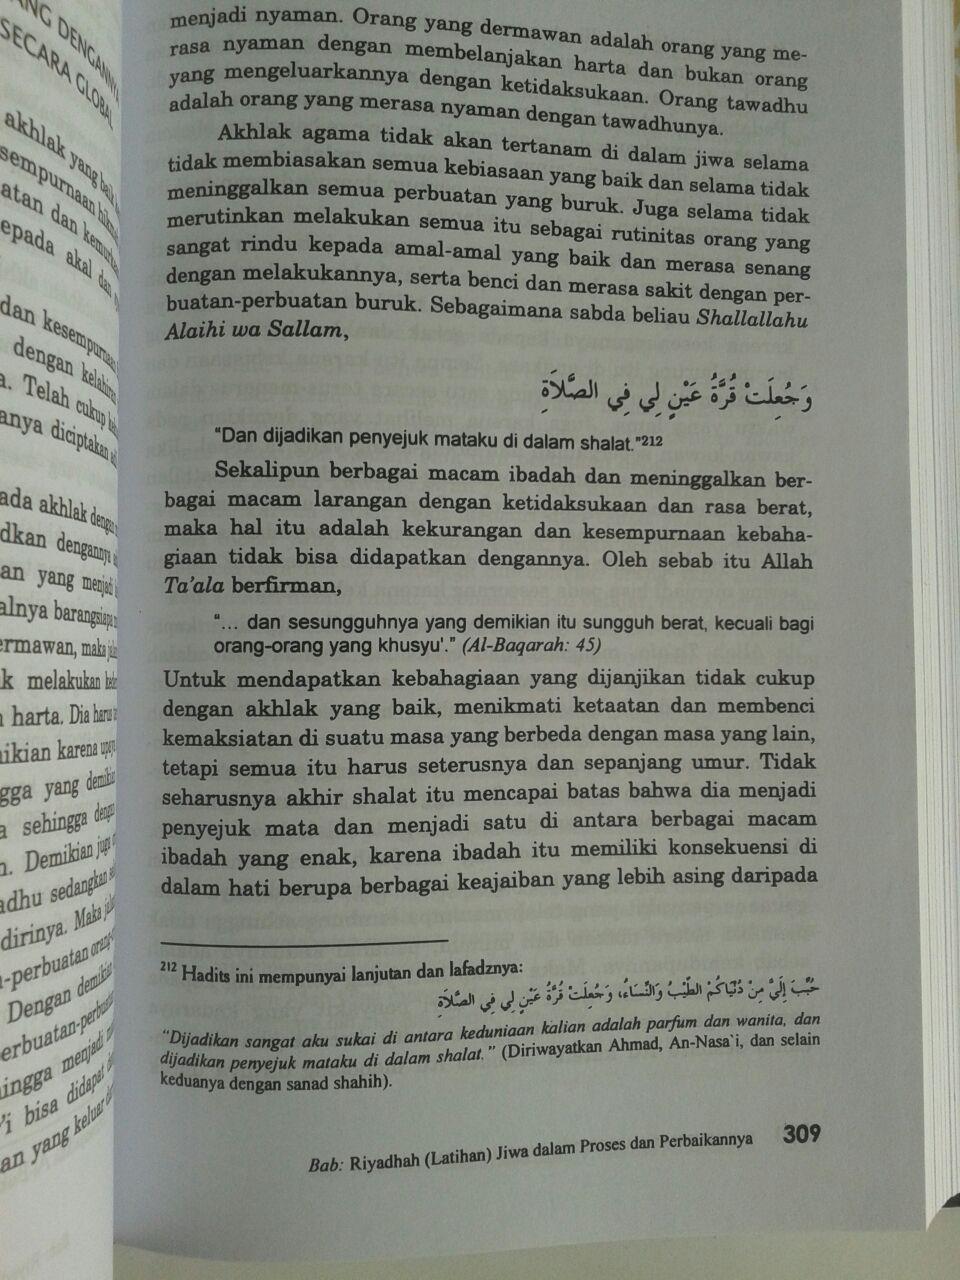 Buku Putih Ihya Ulumuddin Imam Ghazali isi